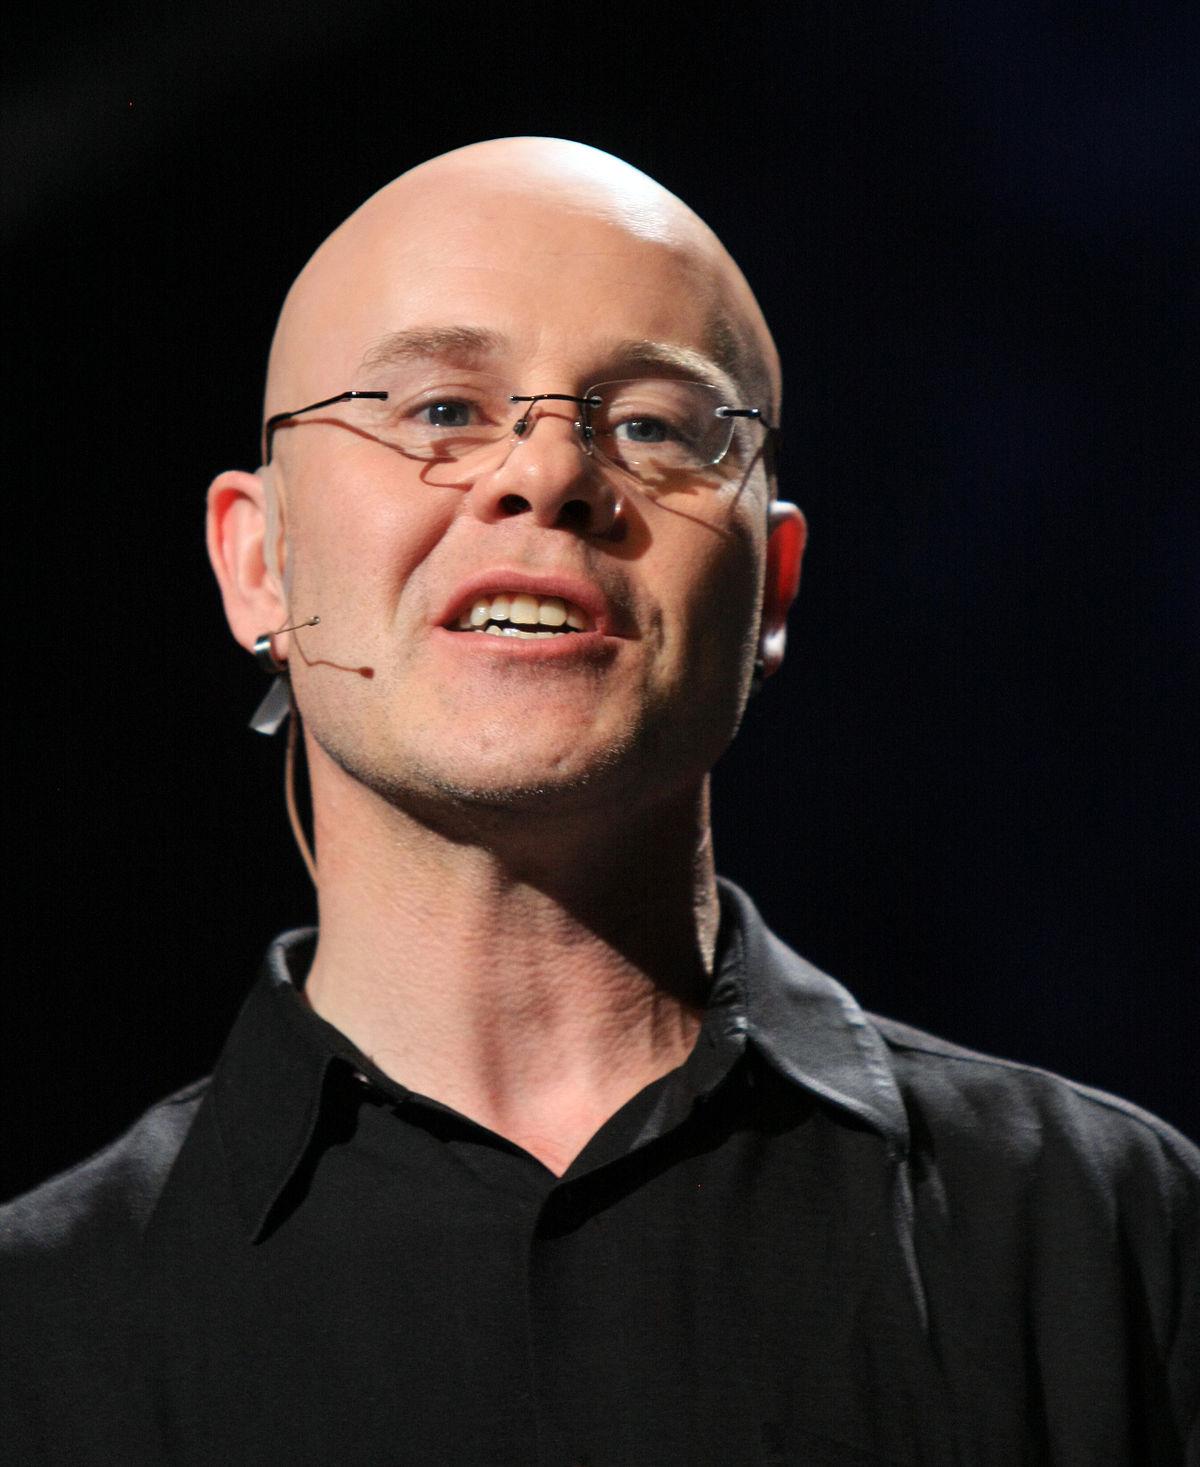 Thomas Dolby Wikipedia La Enciclopedia Libre